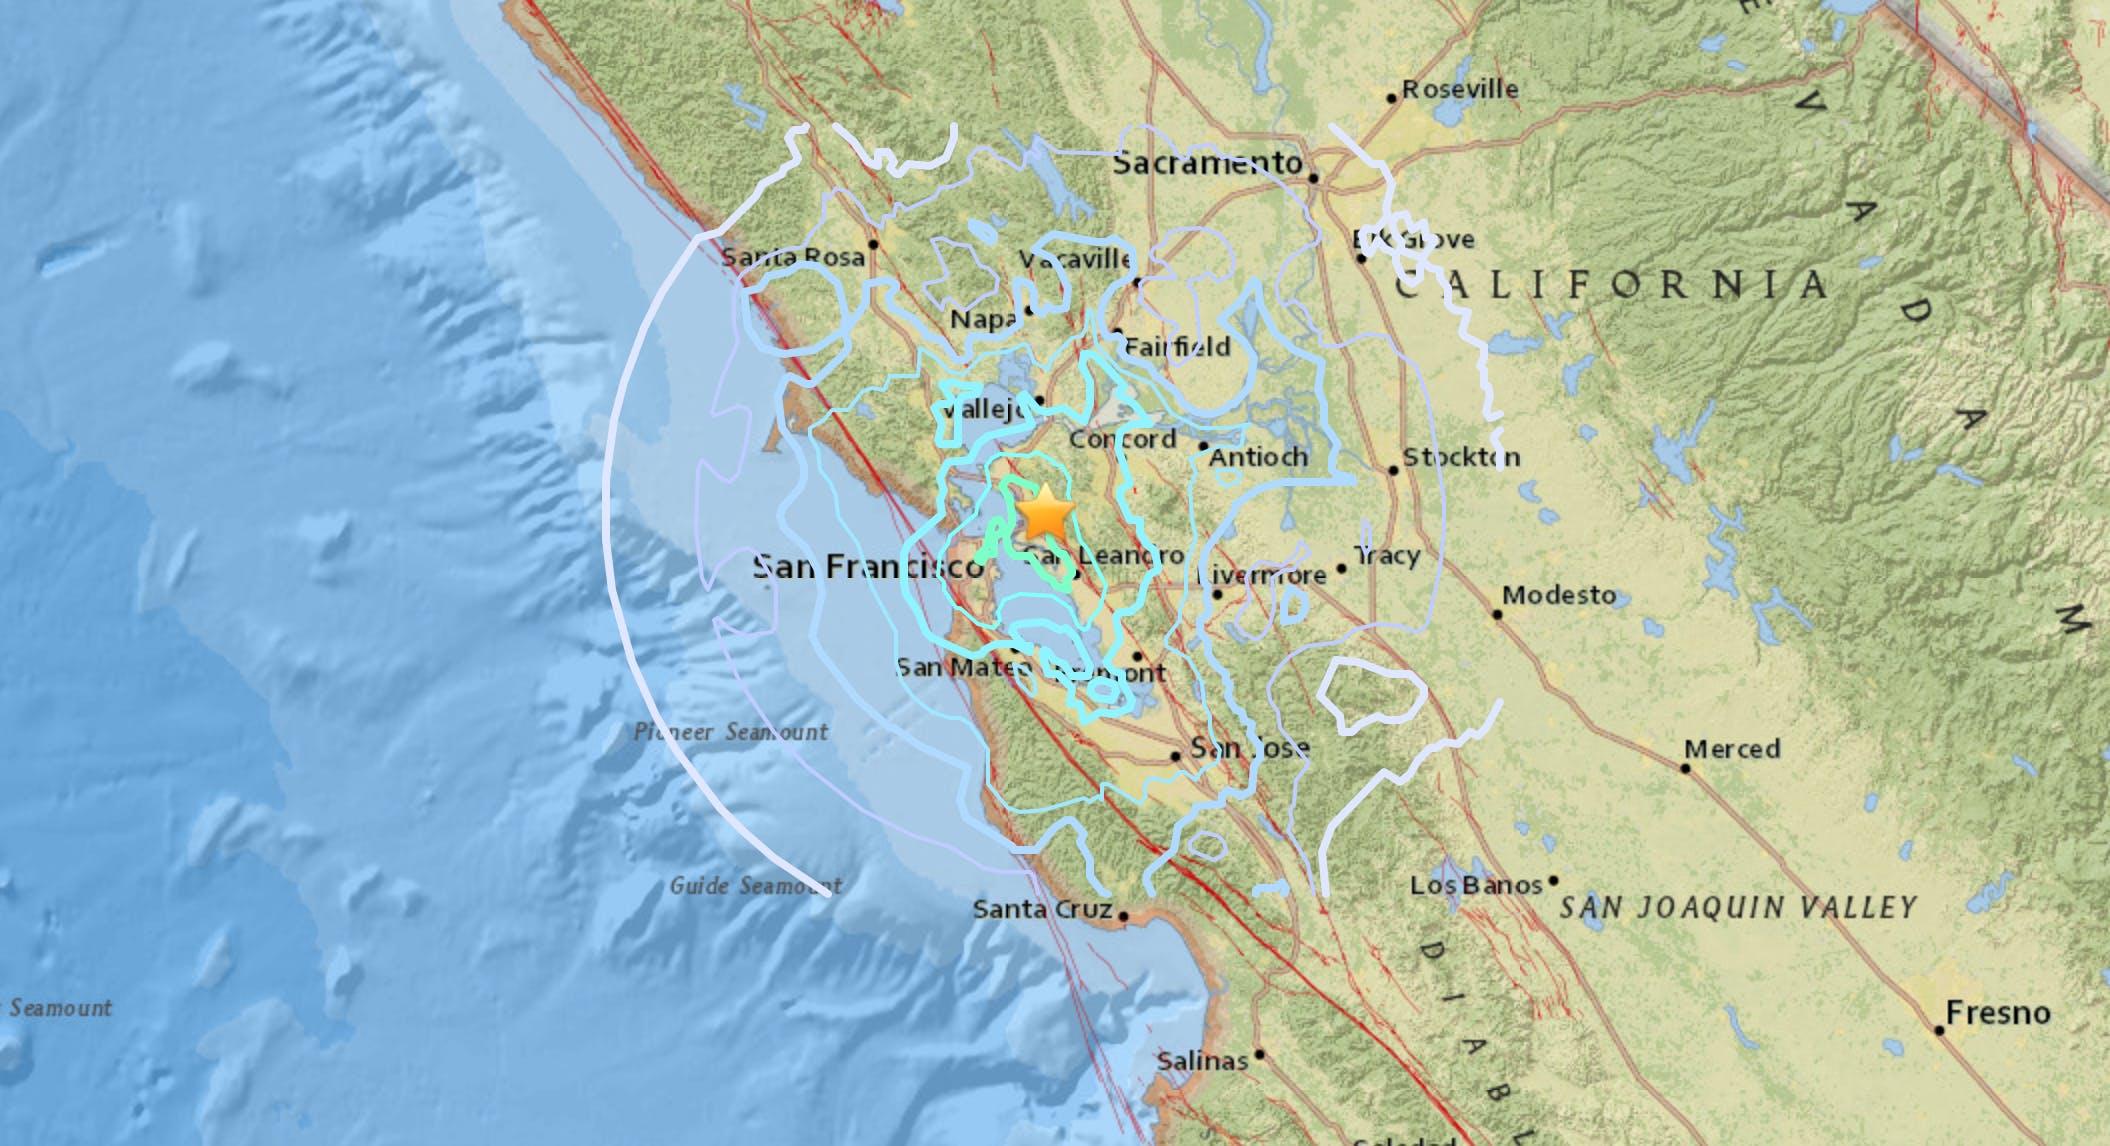 San Francisco Earthquake 3 Maps That Explain The 4 5 Magnitude